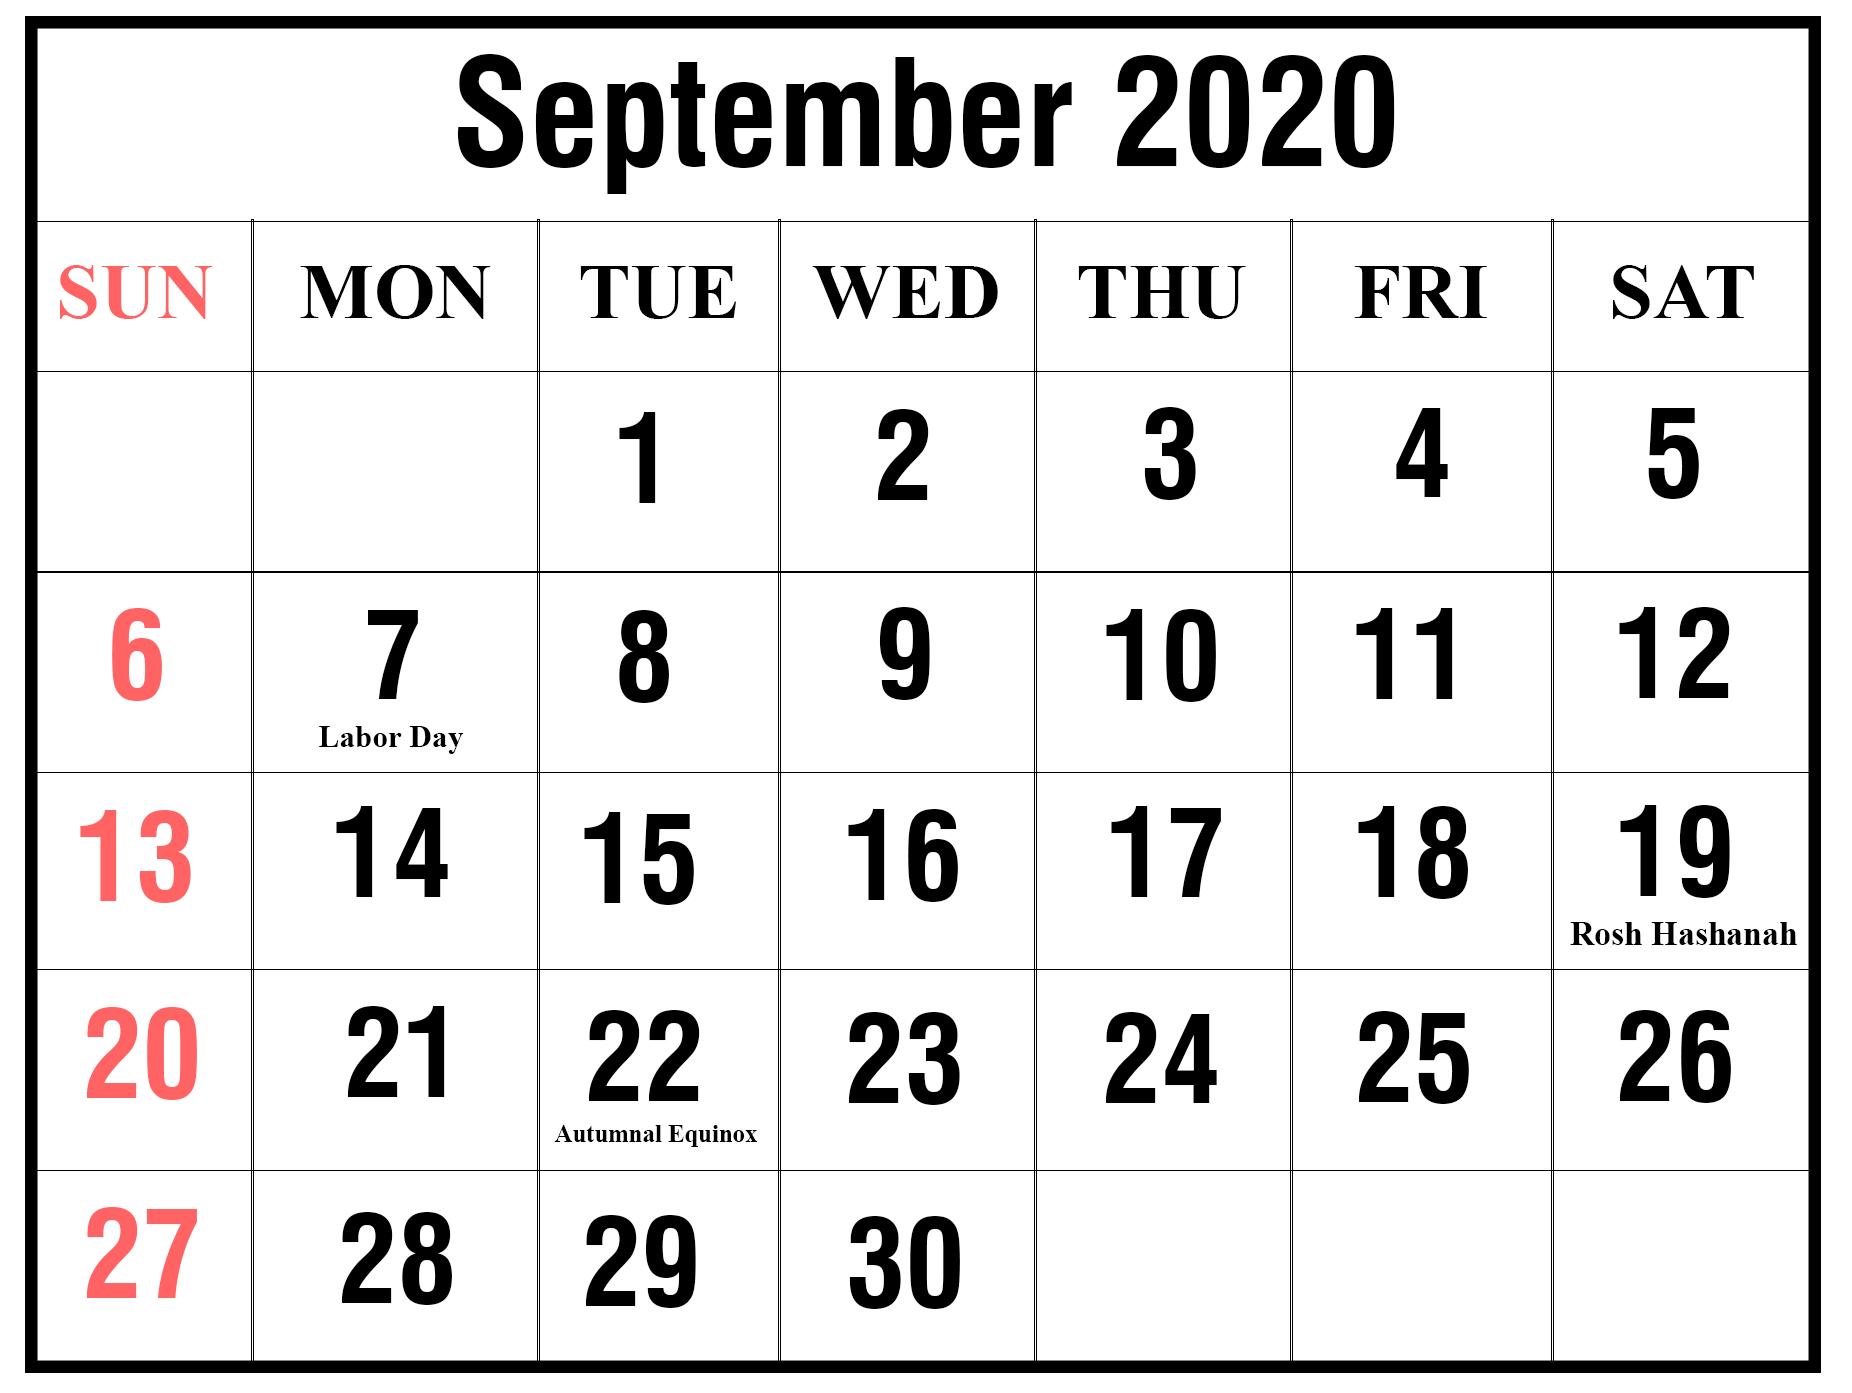 Ko-Fi - September 2020 Calendar Printable - Ko-Fi ❤️ Where